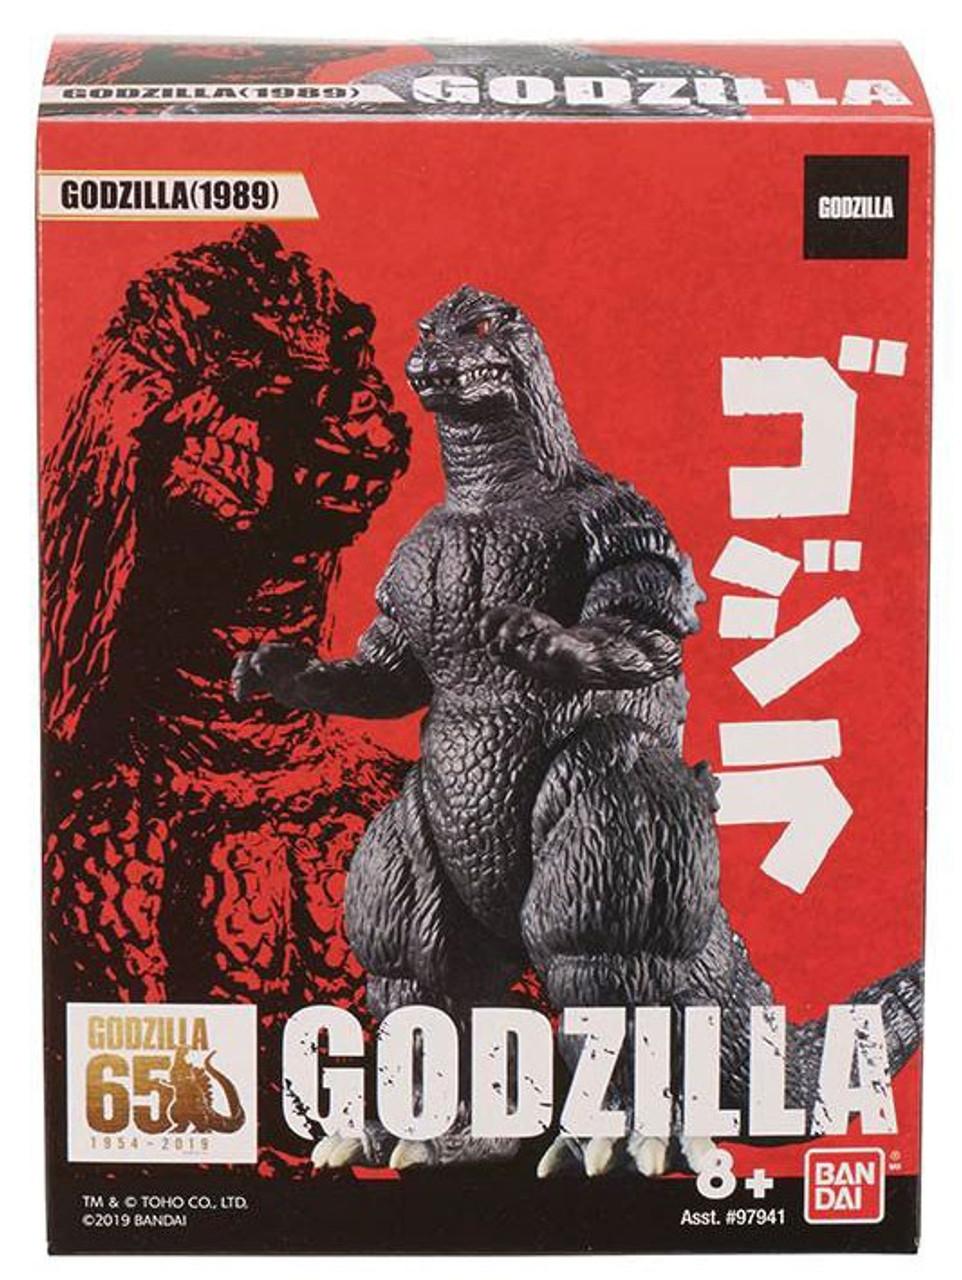 Godzilla Godzilla 1989 3.5 Mini Vinyl Figure Bandai ...